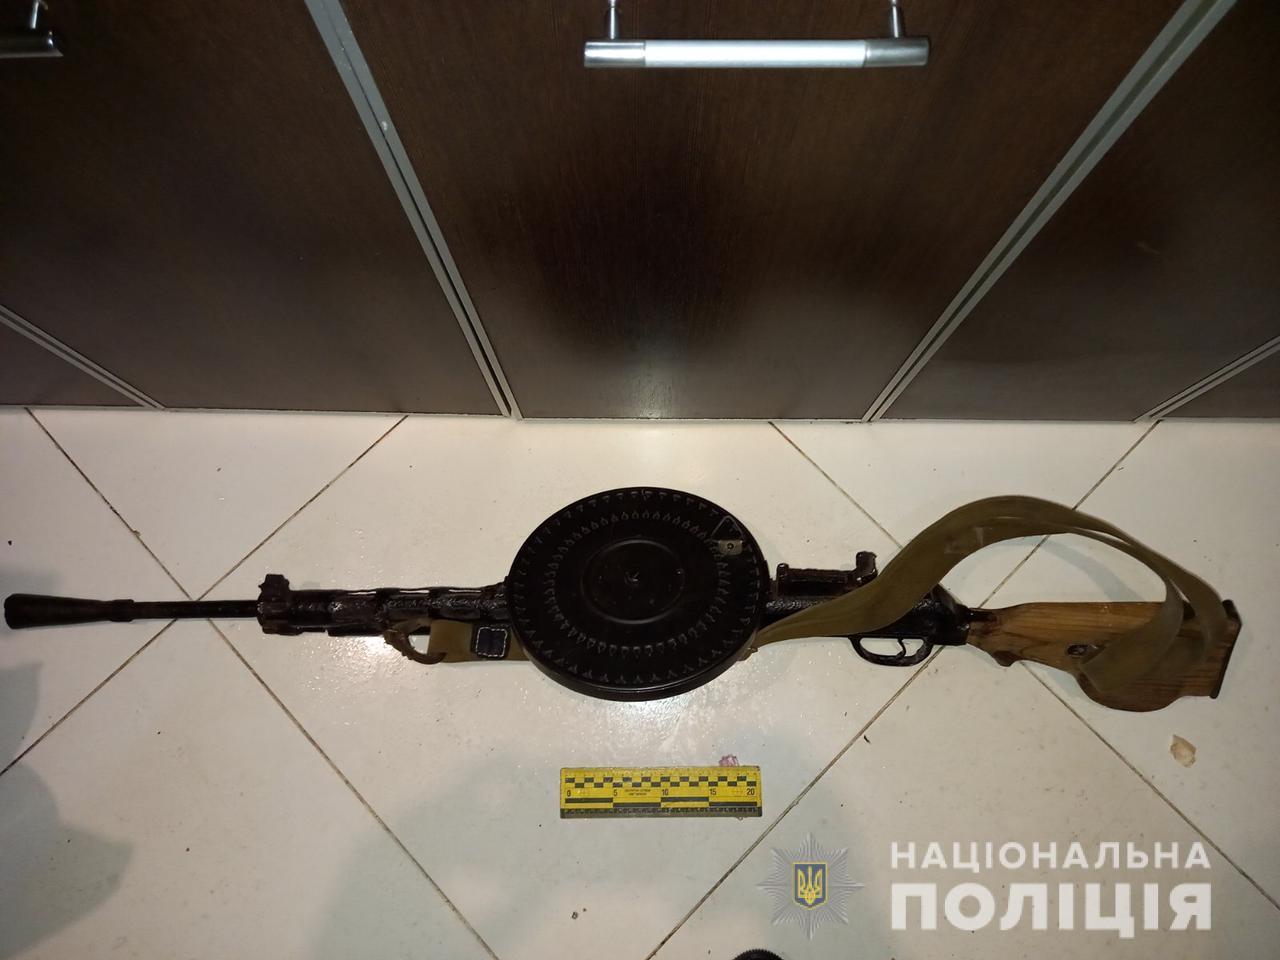 Харьковчанин продавал пулеметы (фото)